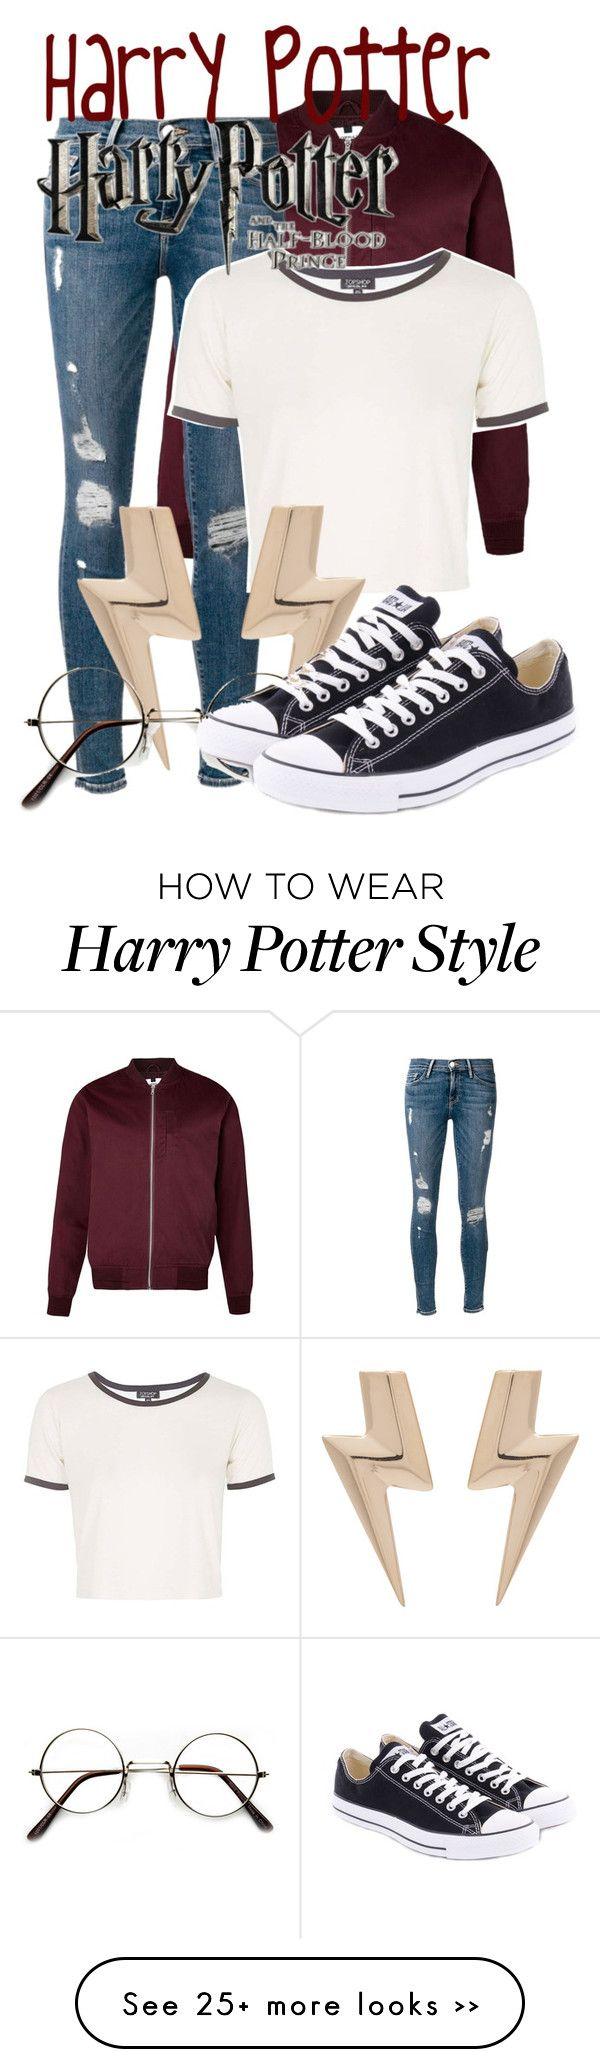 """Harry Potter"" by emilyenchanted on Polyvore"